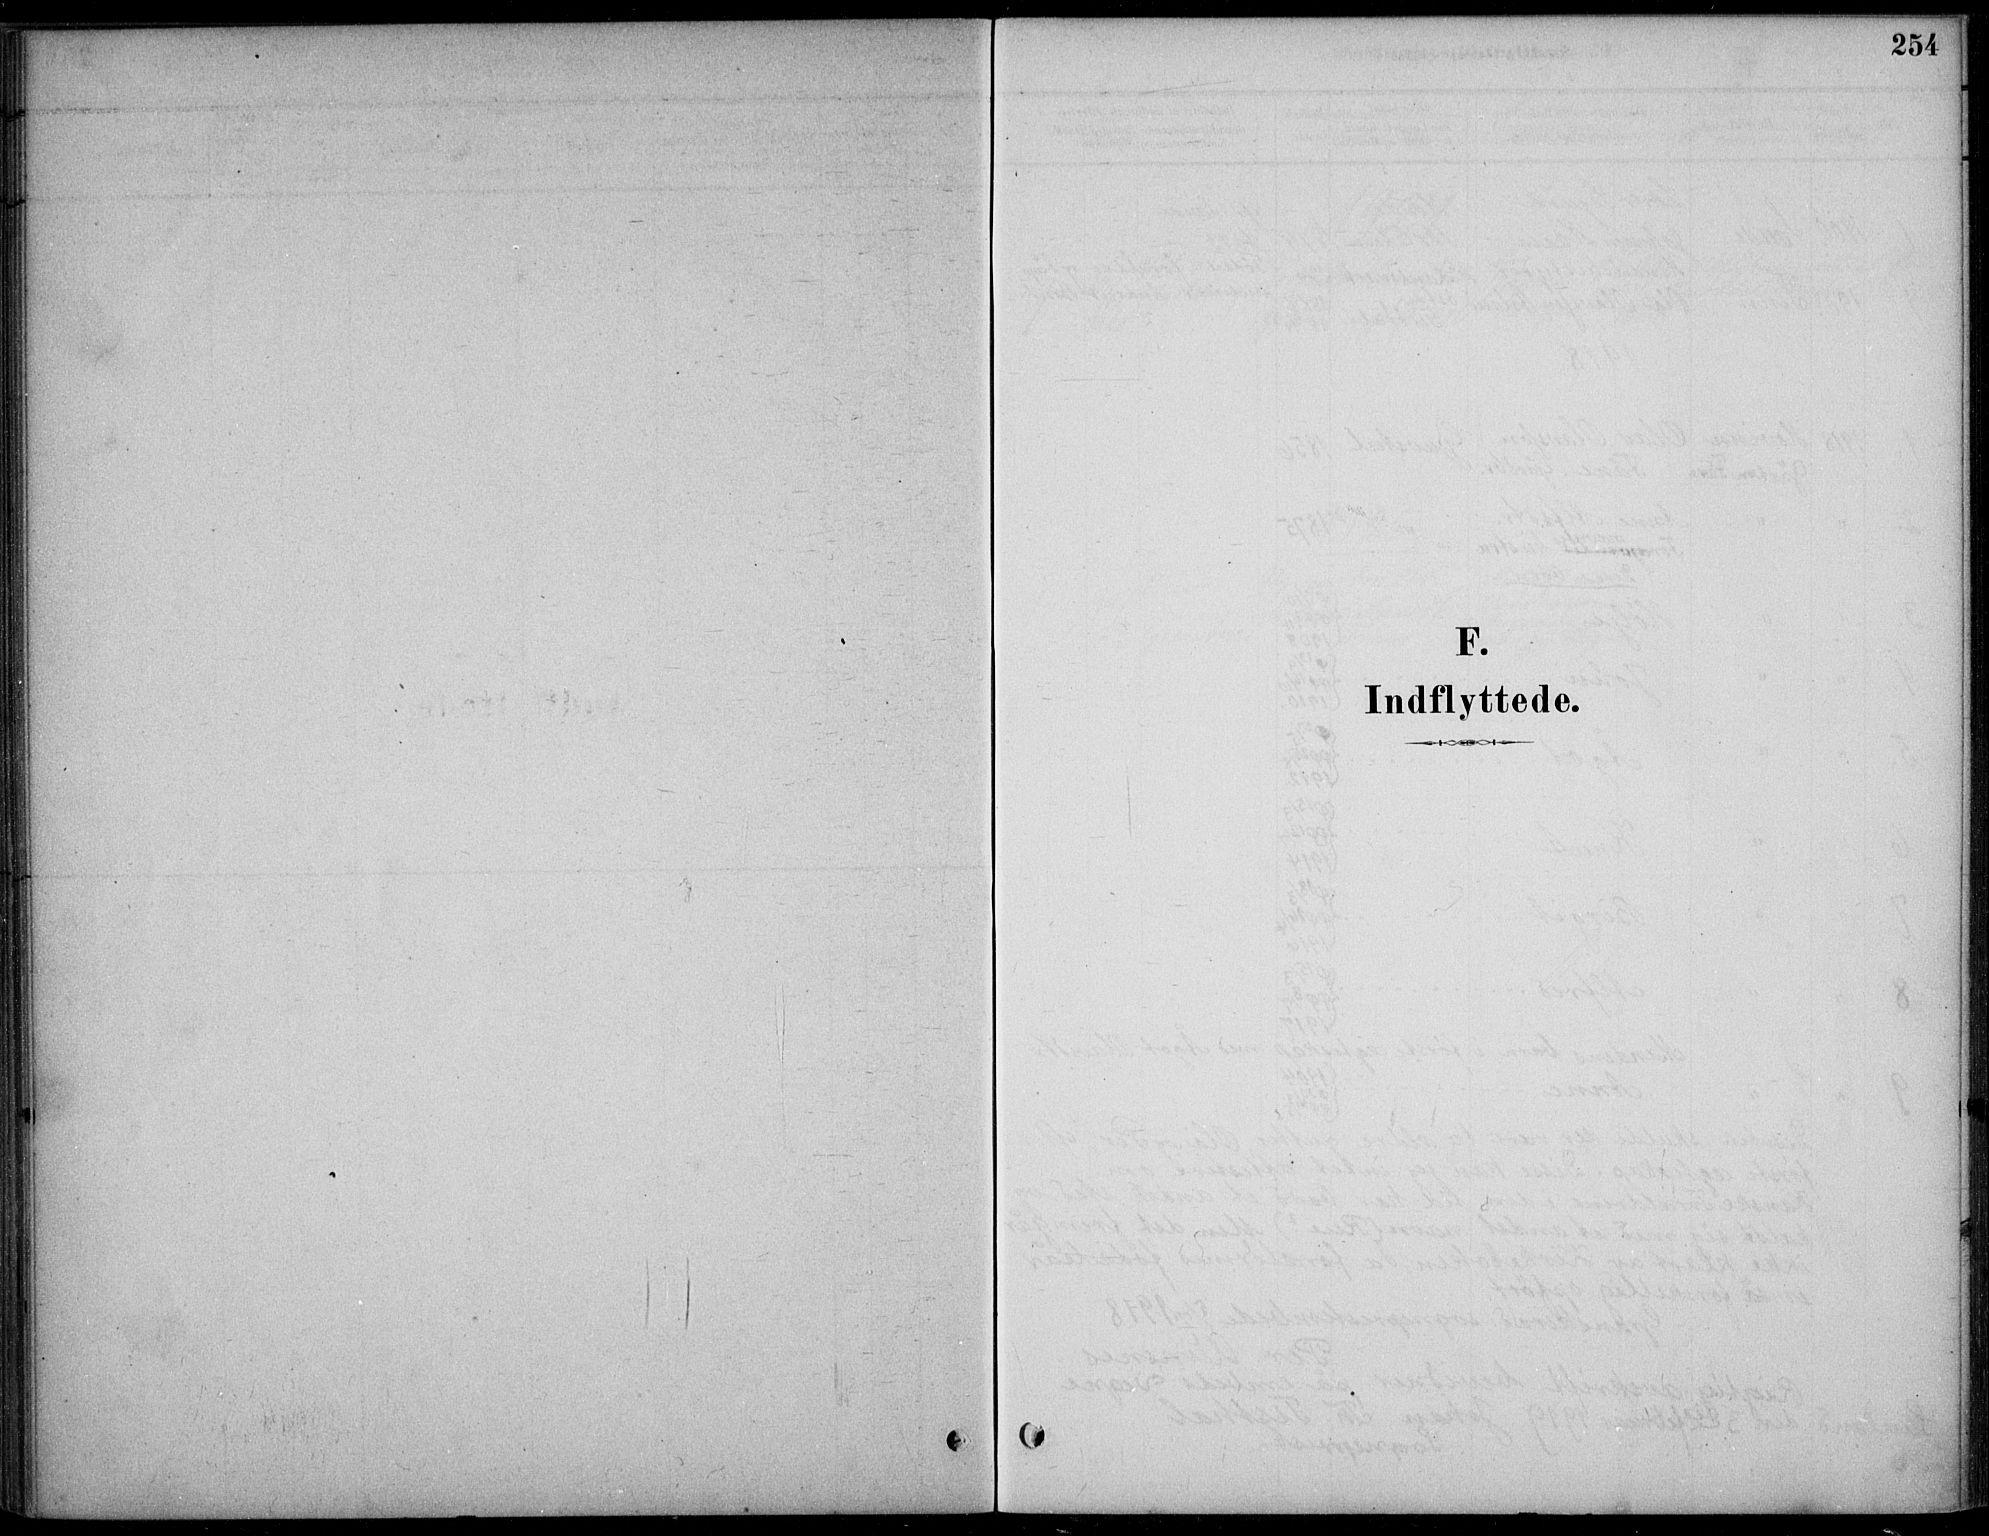 SAKO, Hjartdal kirkebøker, F/Fc/L0002: Ministerialbok nr. III 2, 1880-1936, s. 254